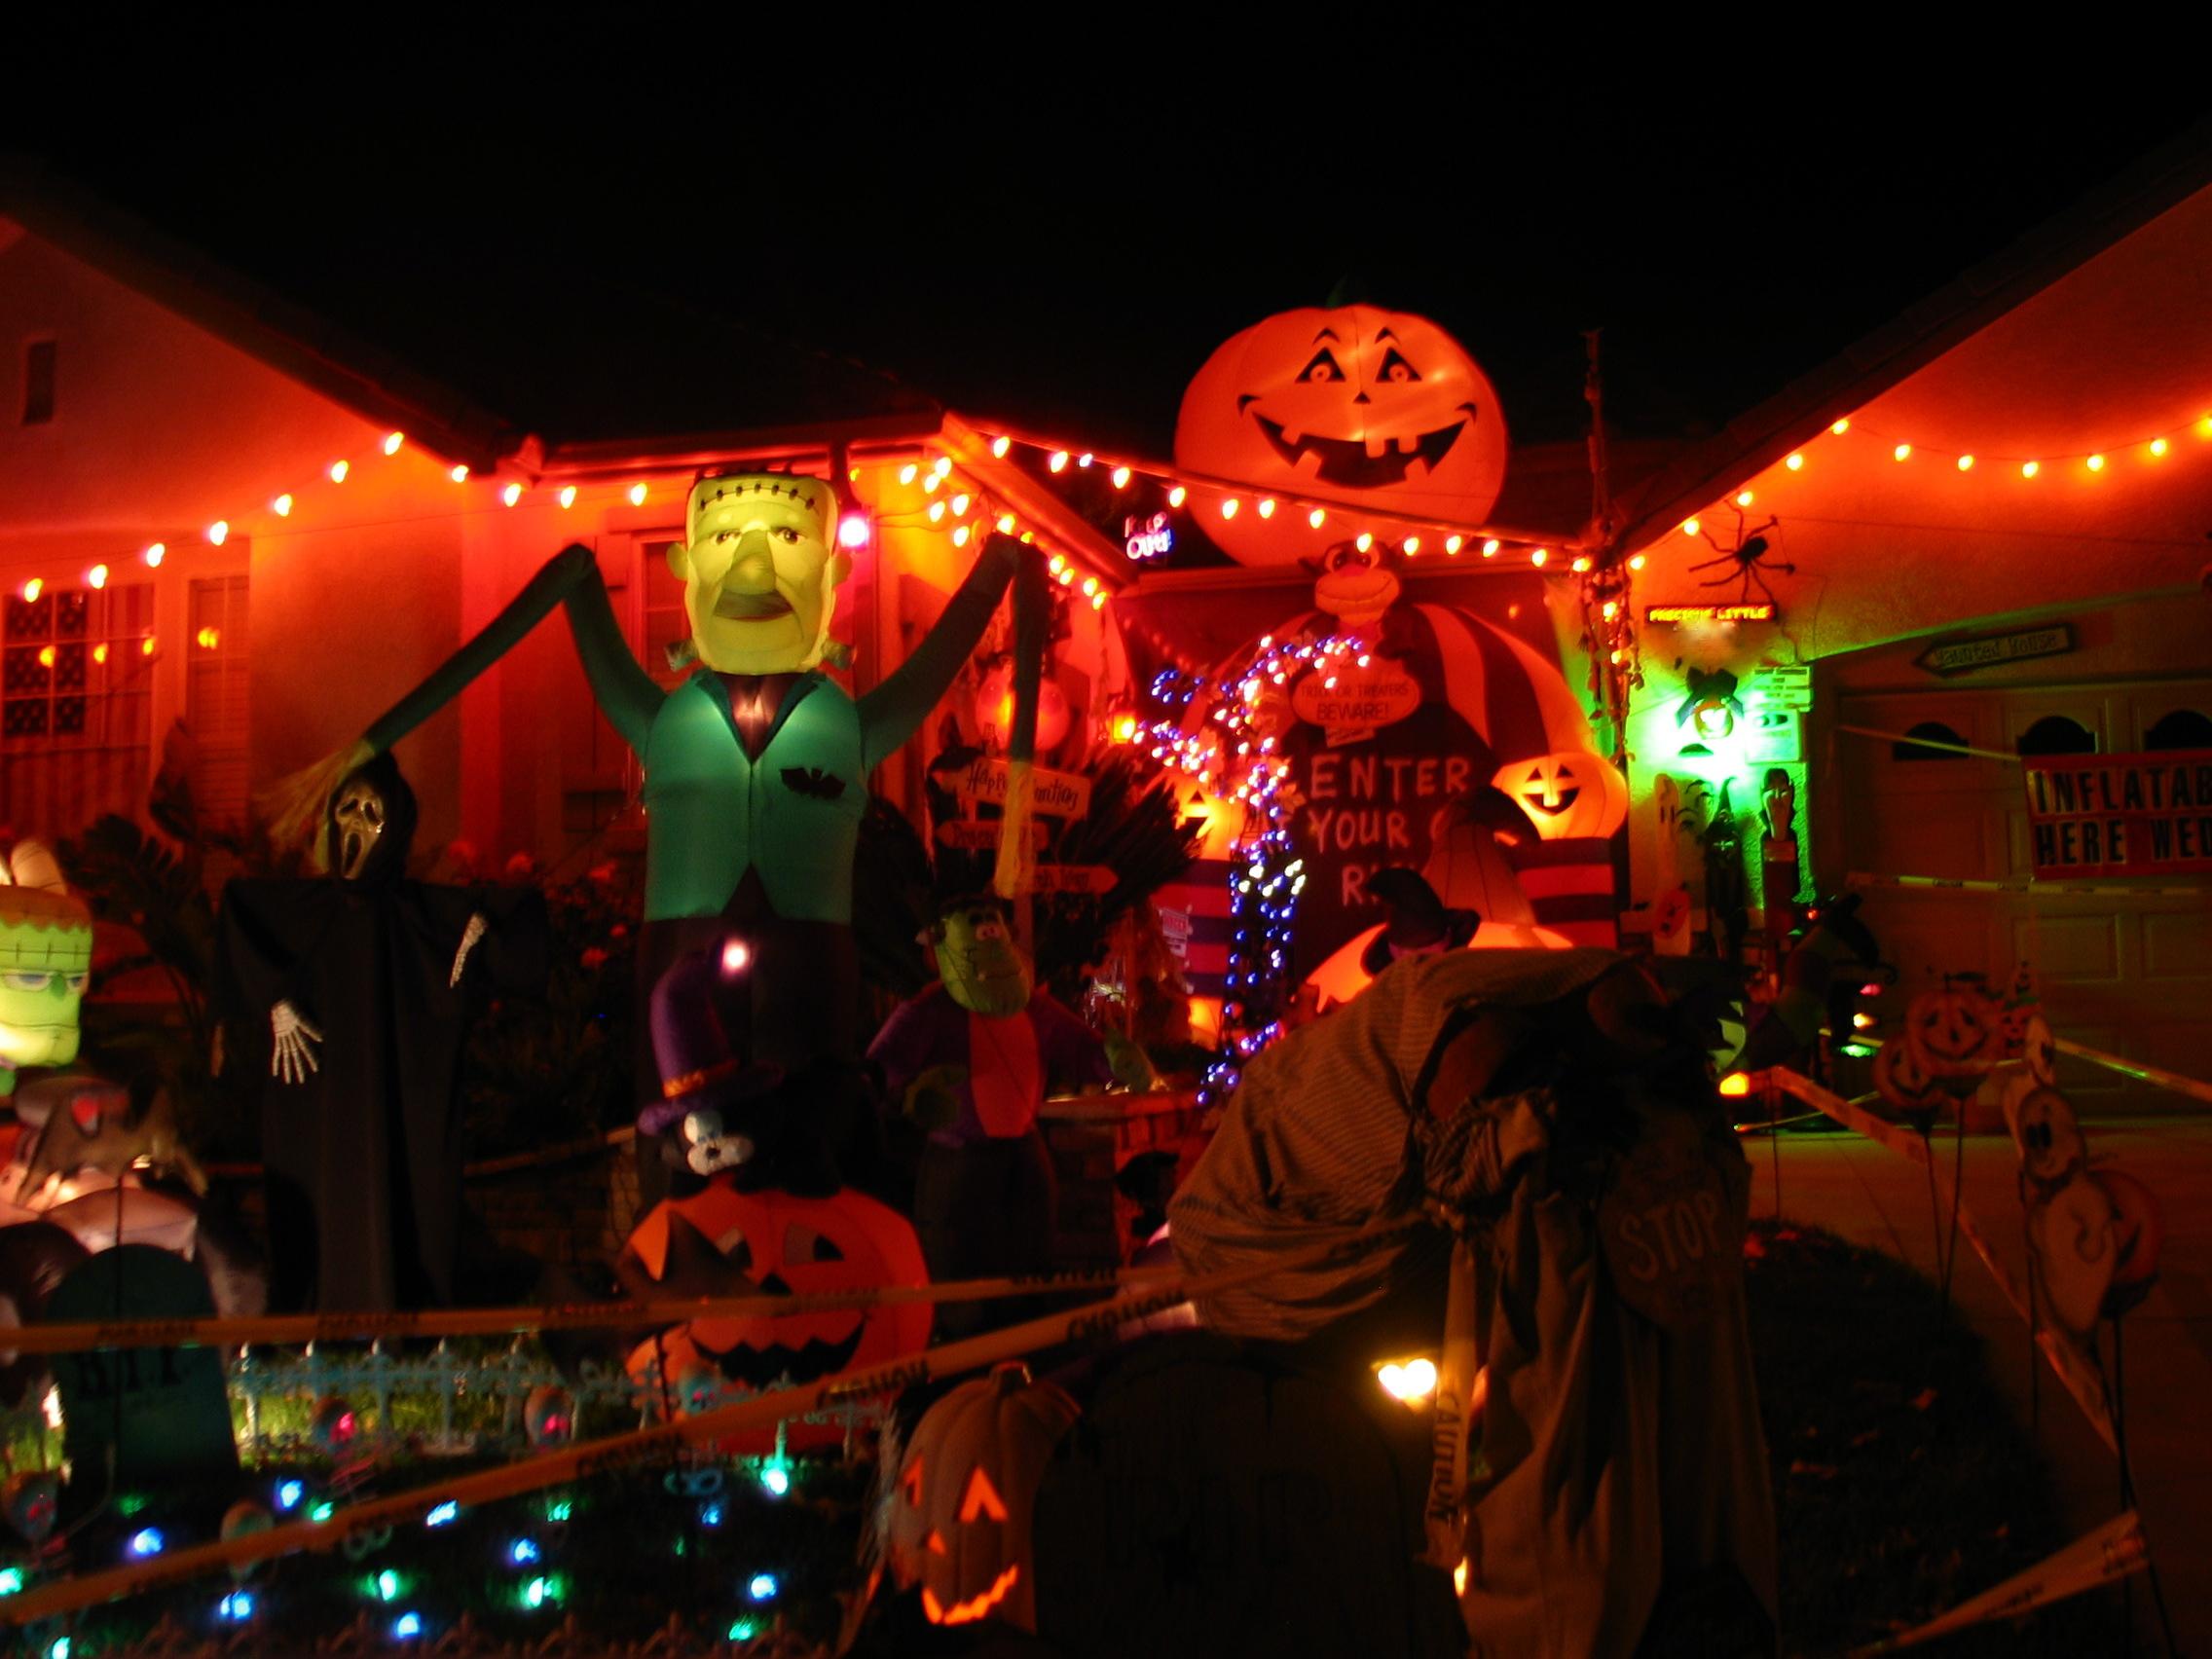 Santa Clarita Halloween Events 2020 Halloween Events in Santa Clarita Planned for This Weekend